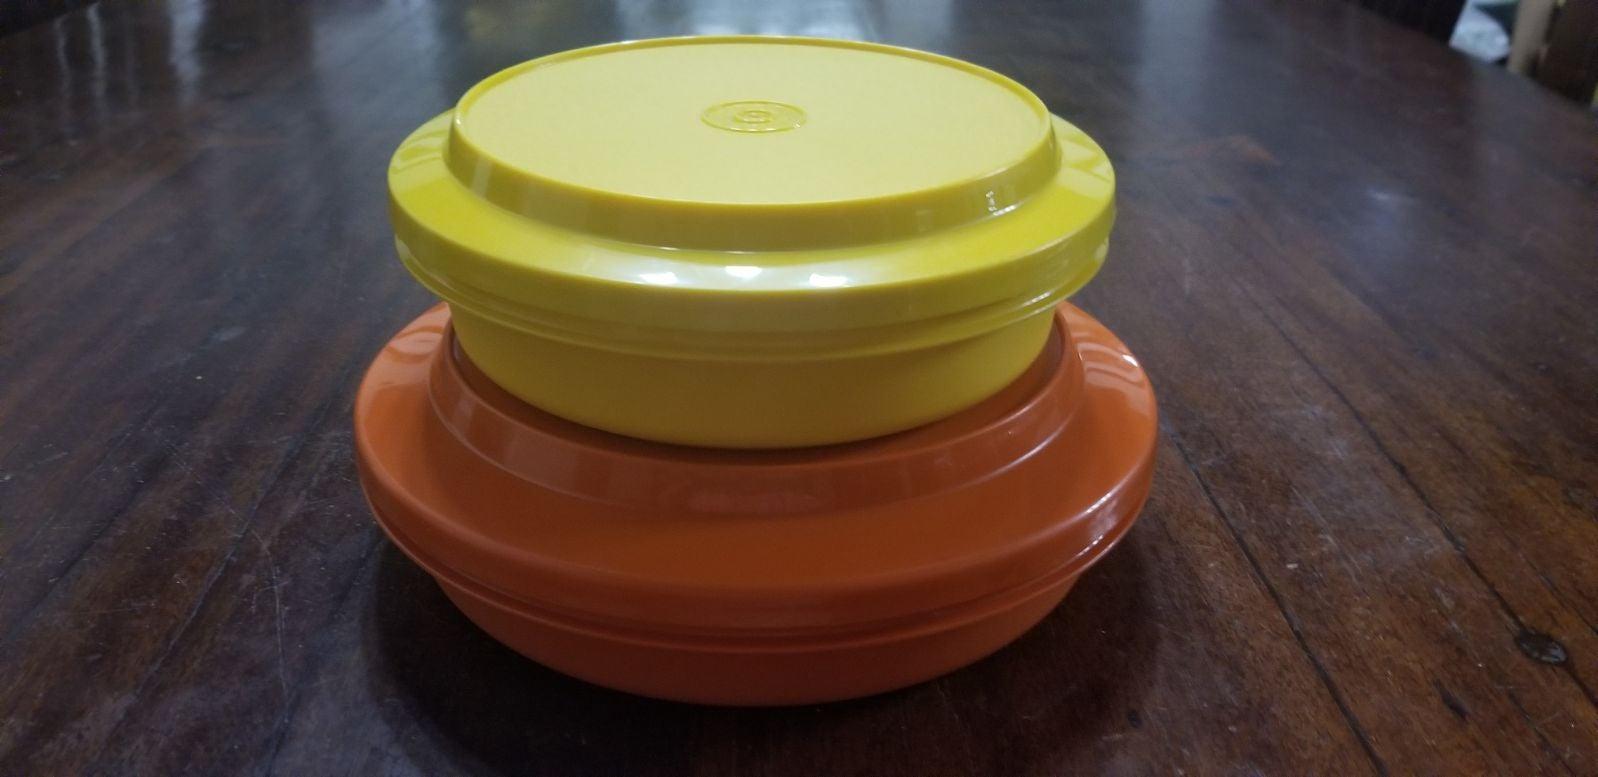 Vintage Tupperware Seal and Serve